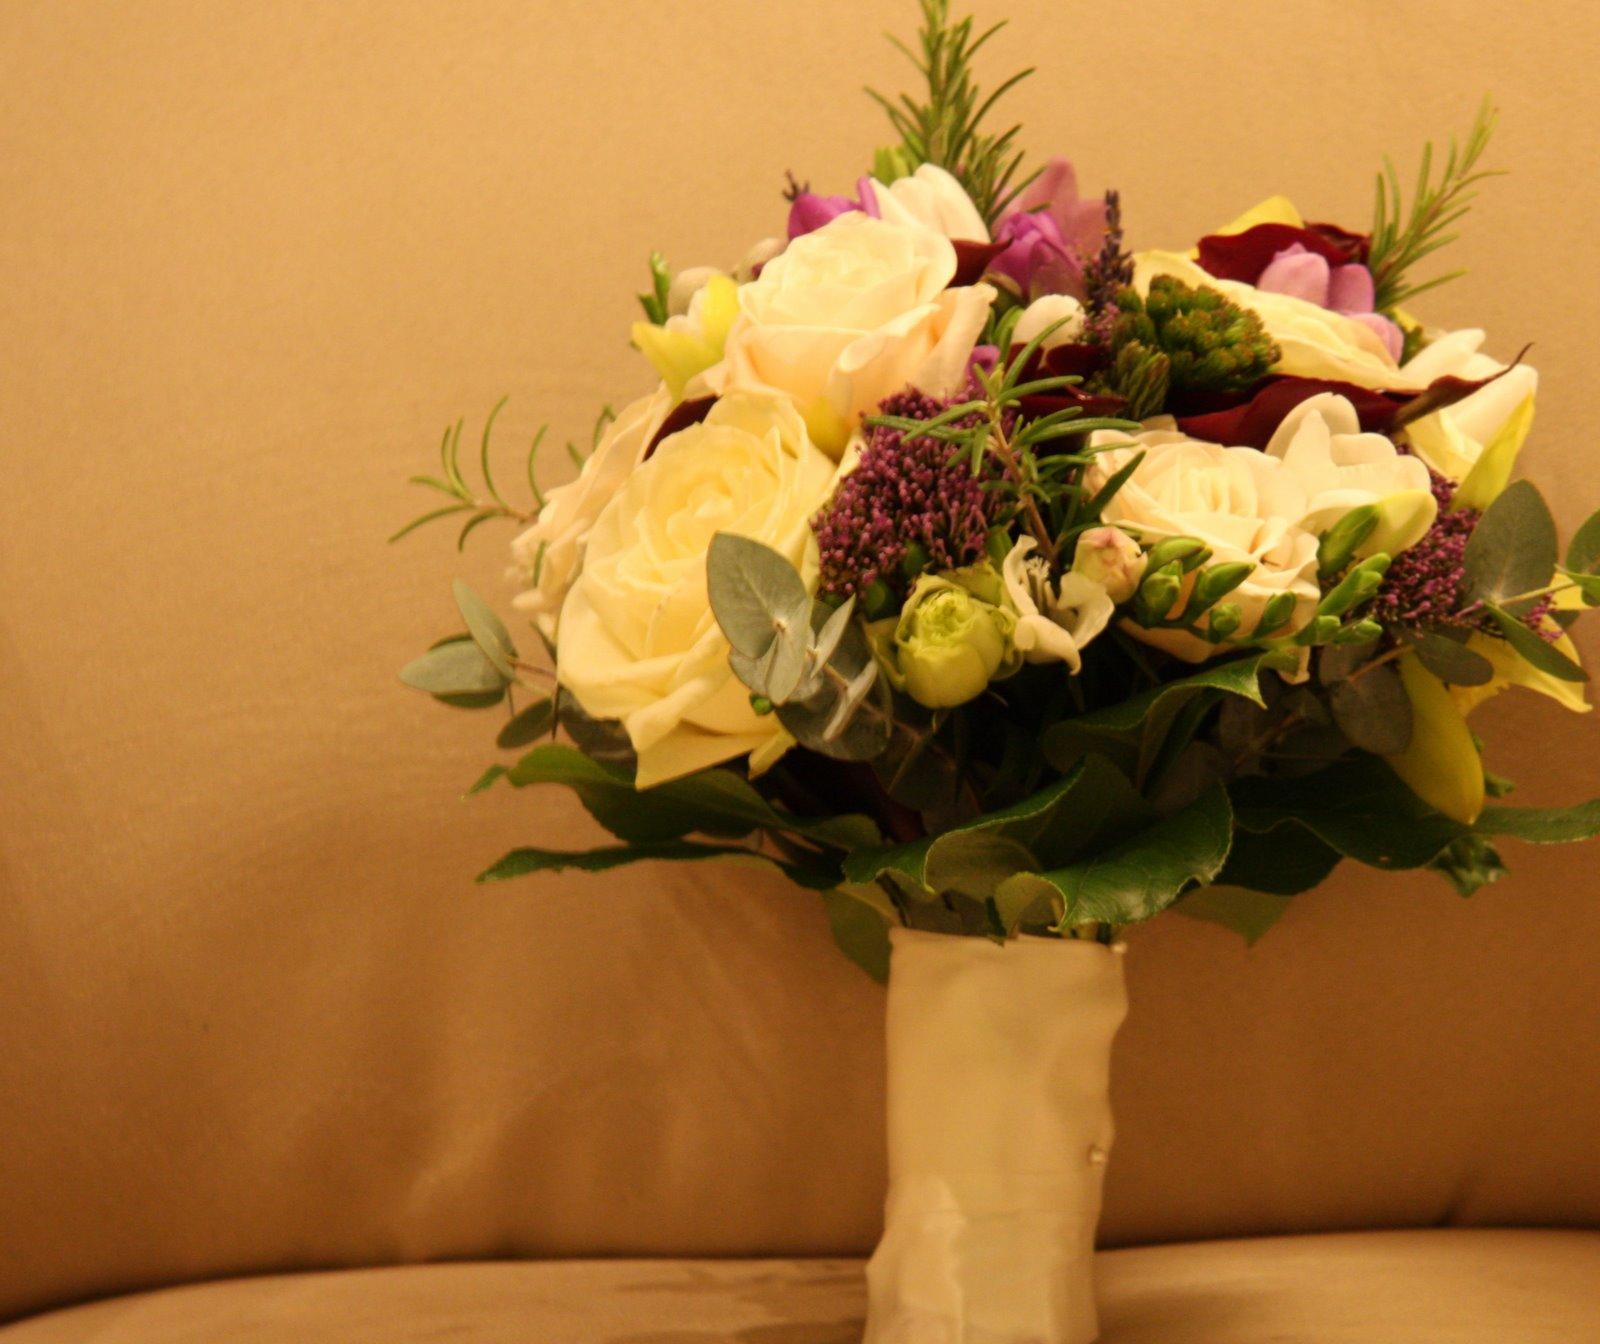 Wedding Flowers Lancashire: The Flower Magician: Cream & Purple Spring Wedding Bouquet